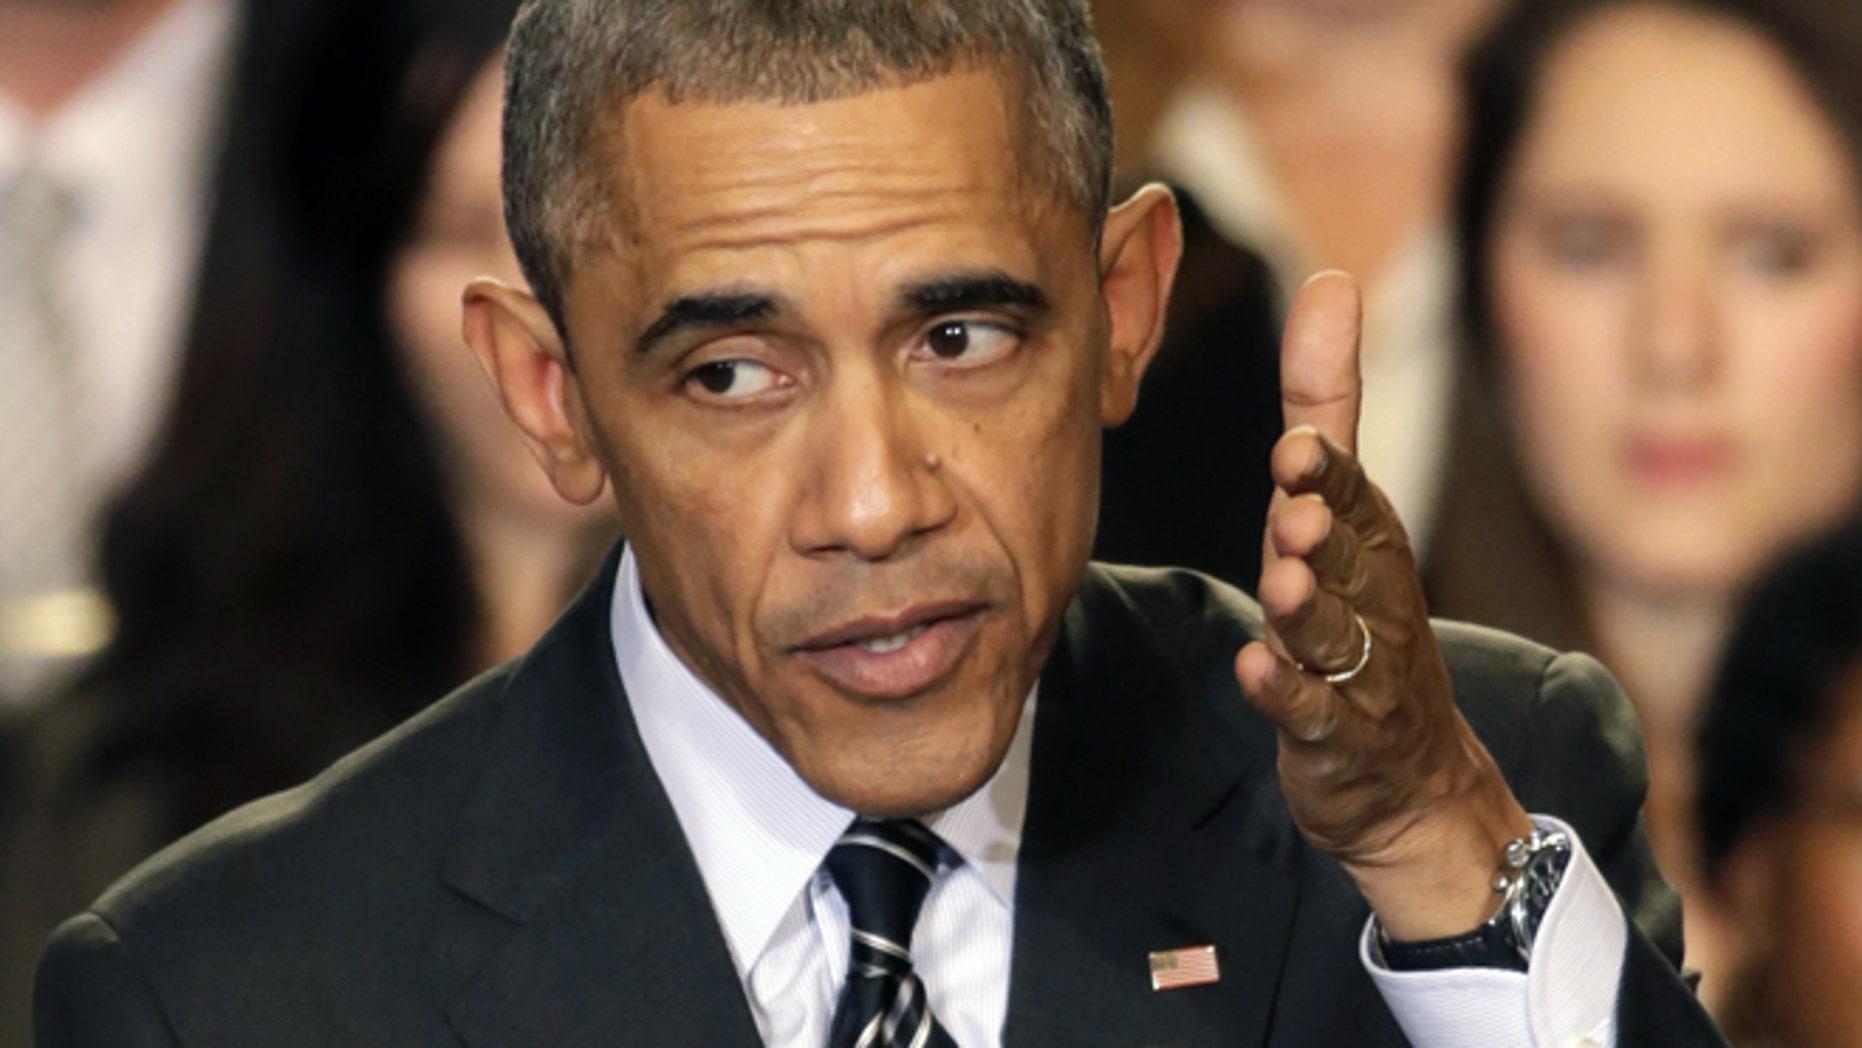 President Obama speaks in Chicago.